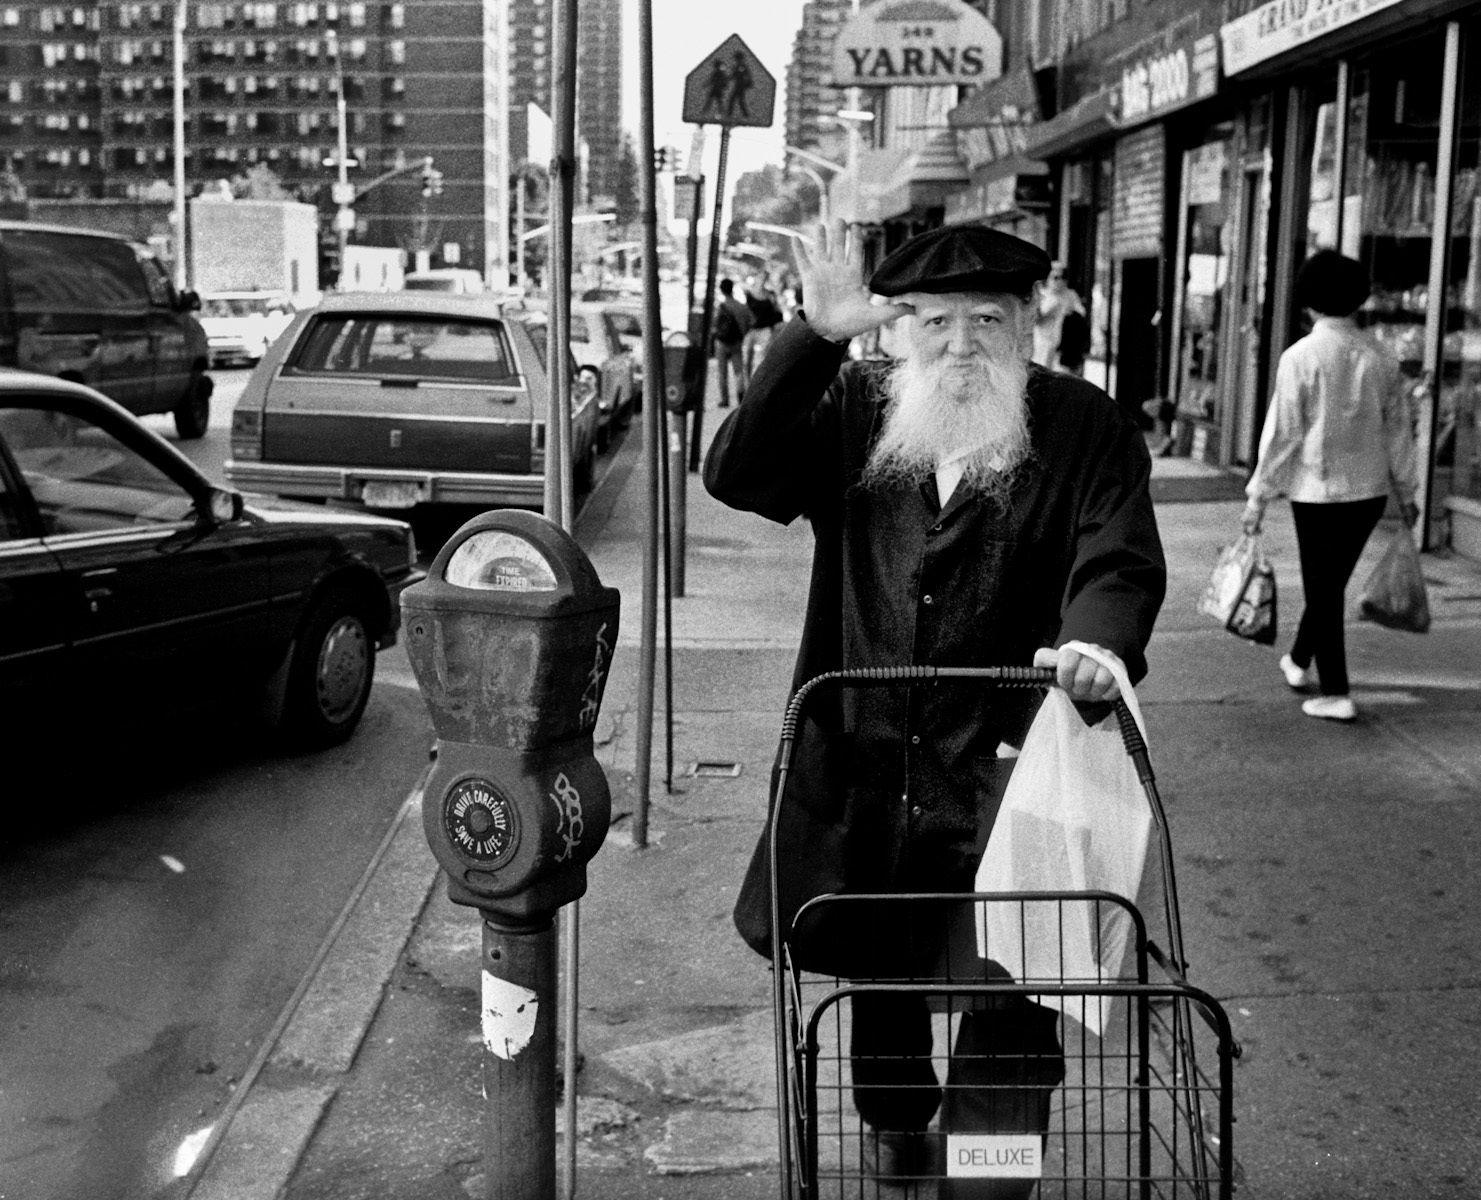 Lower East Side, New York 10/02/94